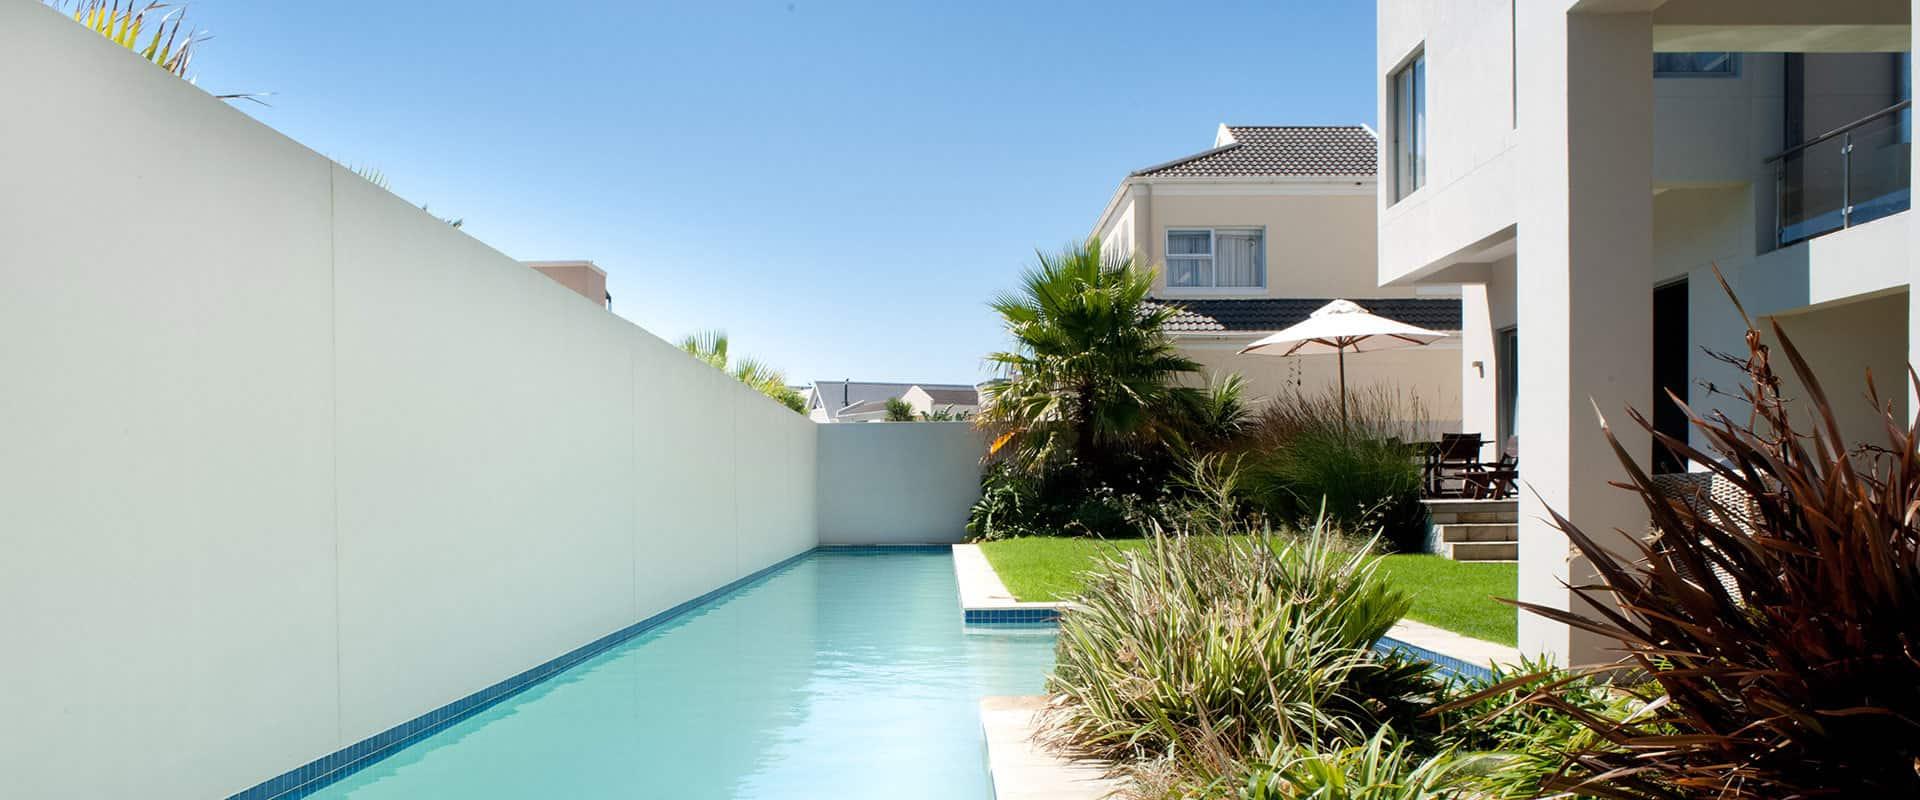 da Heim Guesthouse Kapstadt Pool und Garten